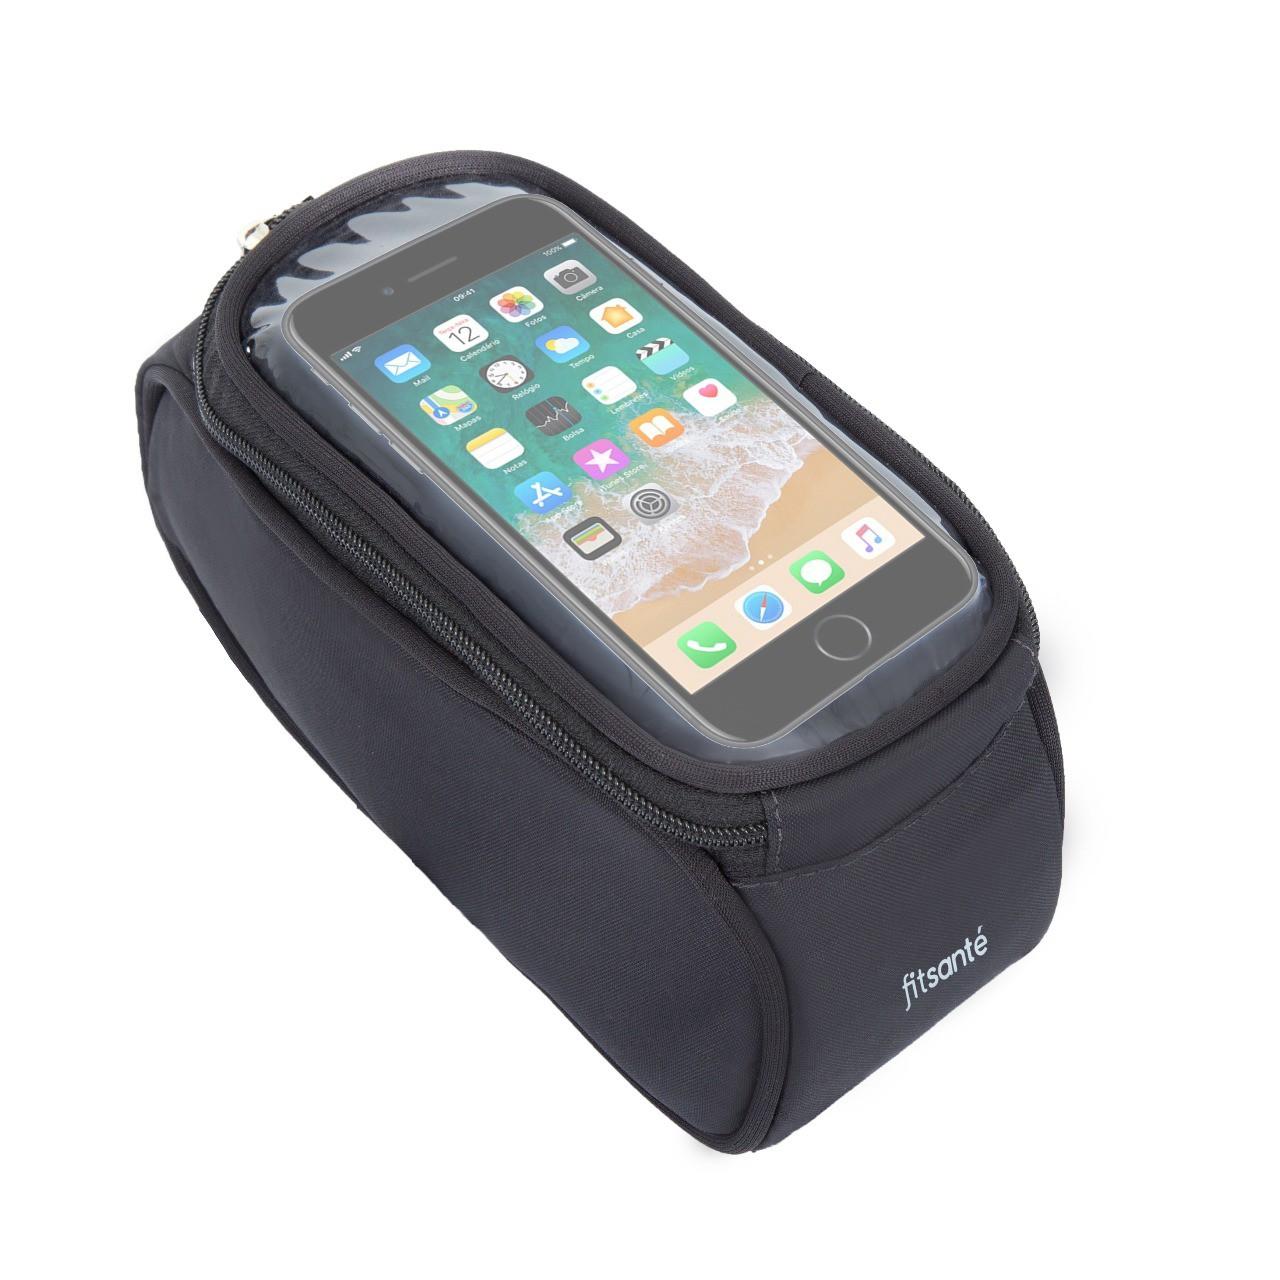 Kit Bolsa de Quadro FitSanté com porta Celular + Luva